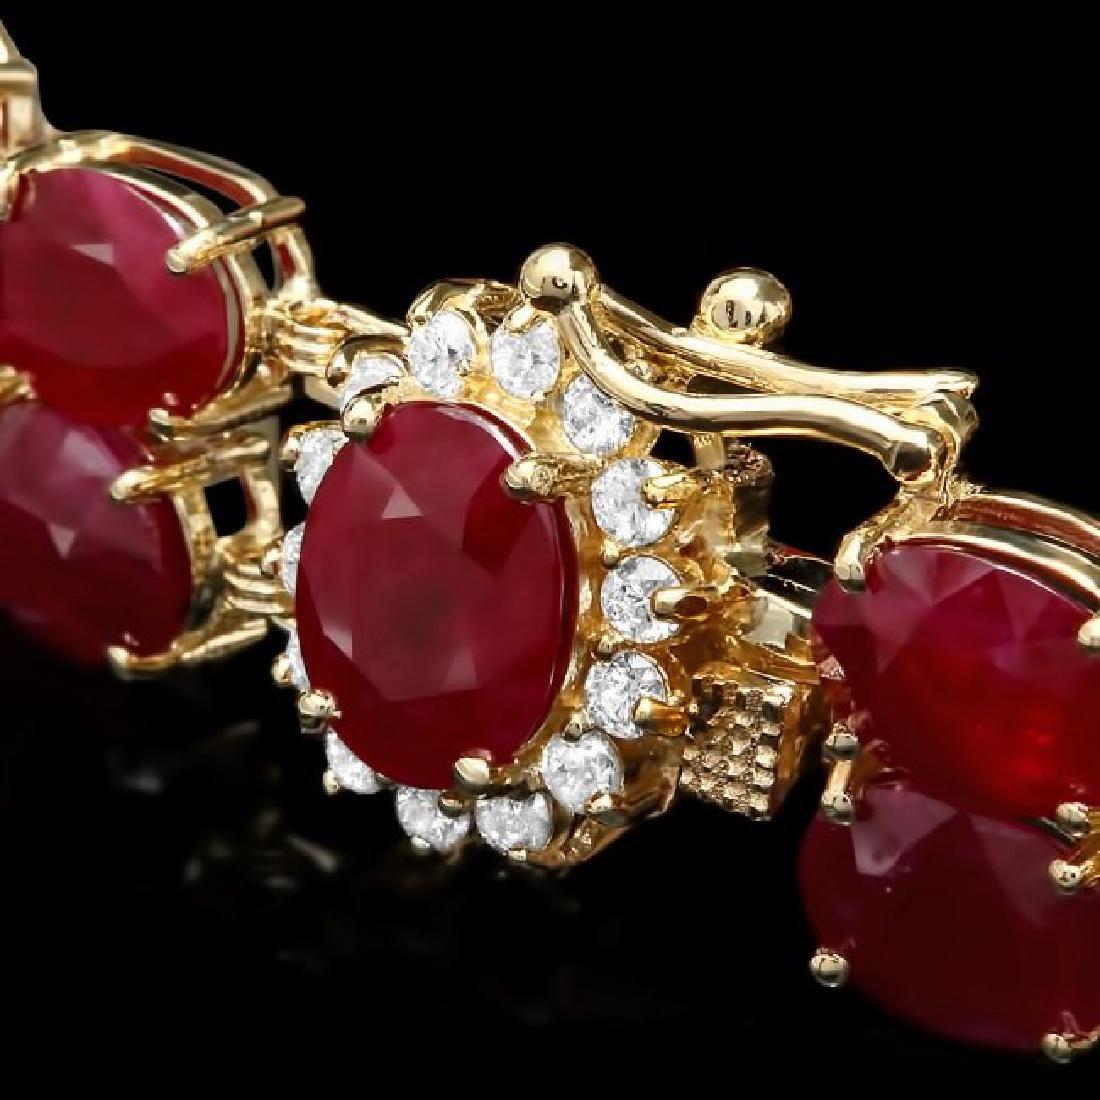 14k Gold 53.00ct Ruby 0.50ct Diamond Bracelet - 2